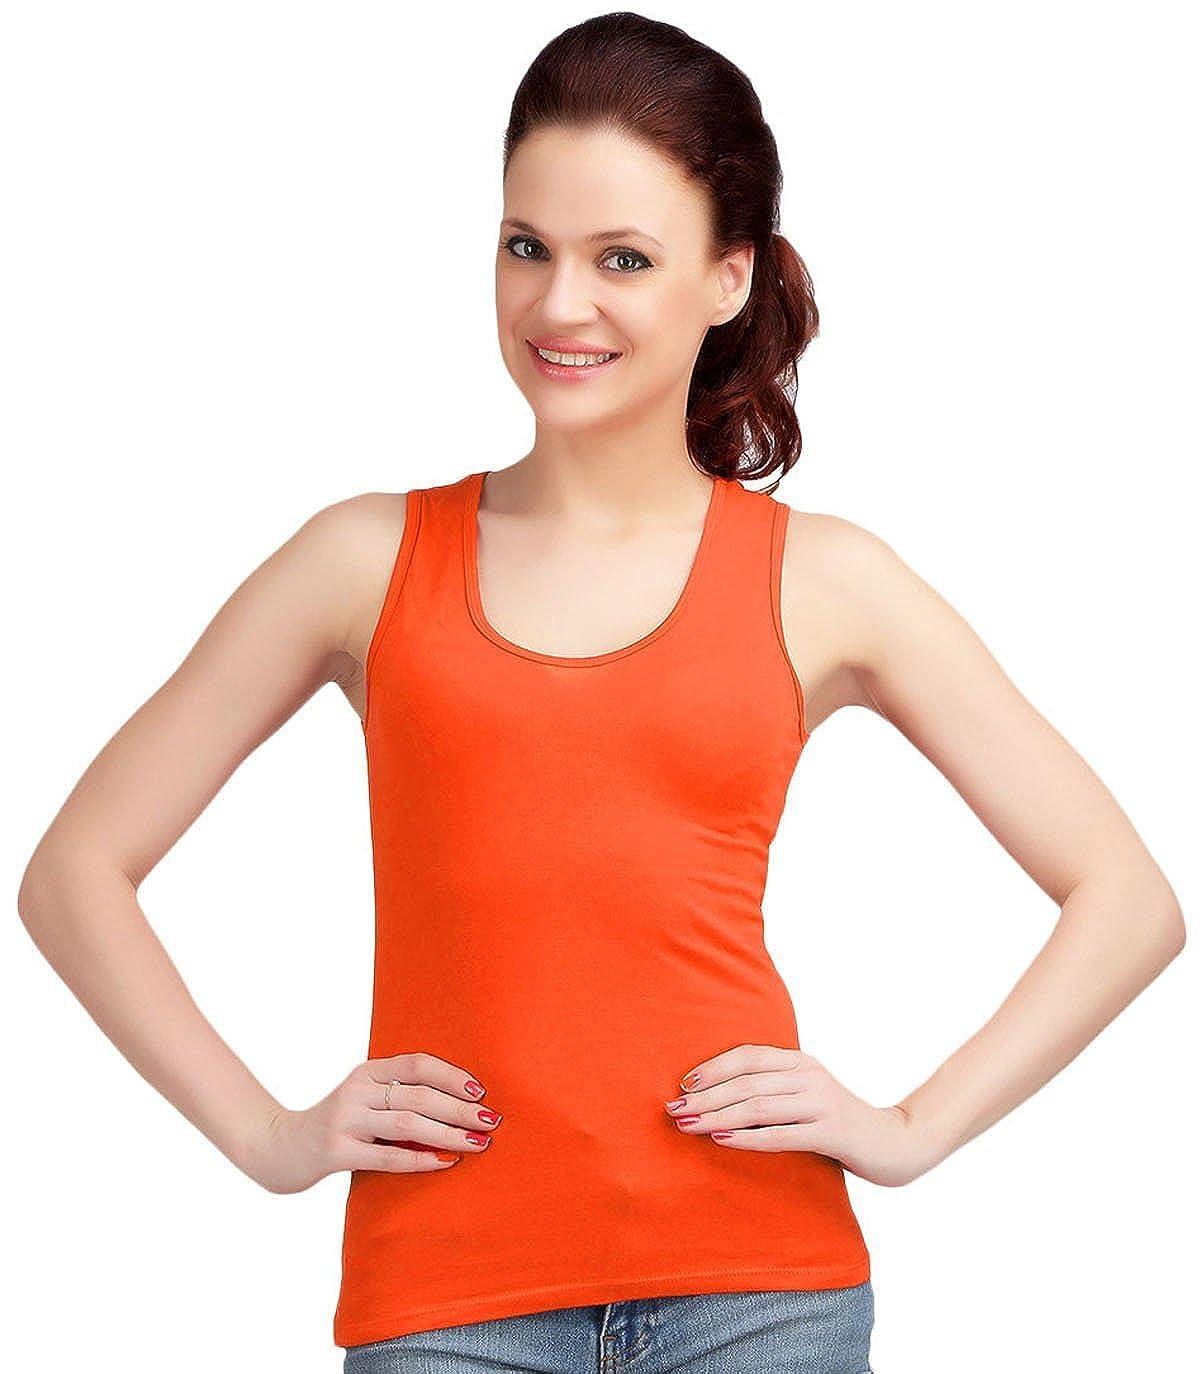 374600a0 Women Sando Style Camisole Vest Sleeveless Top T-Shirt Summer Tank at  Amazon Women's Clothing store: